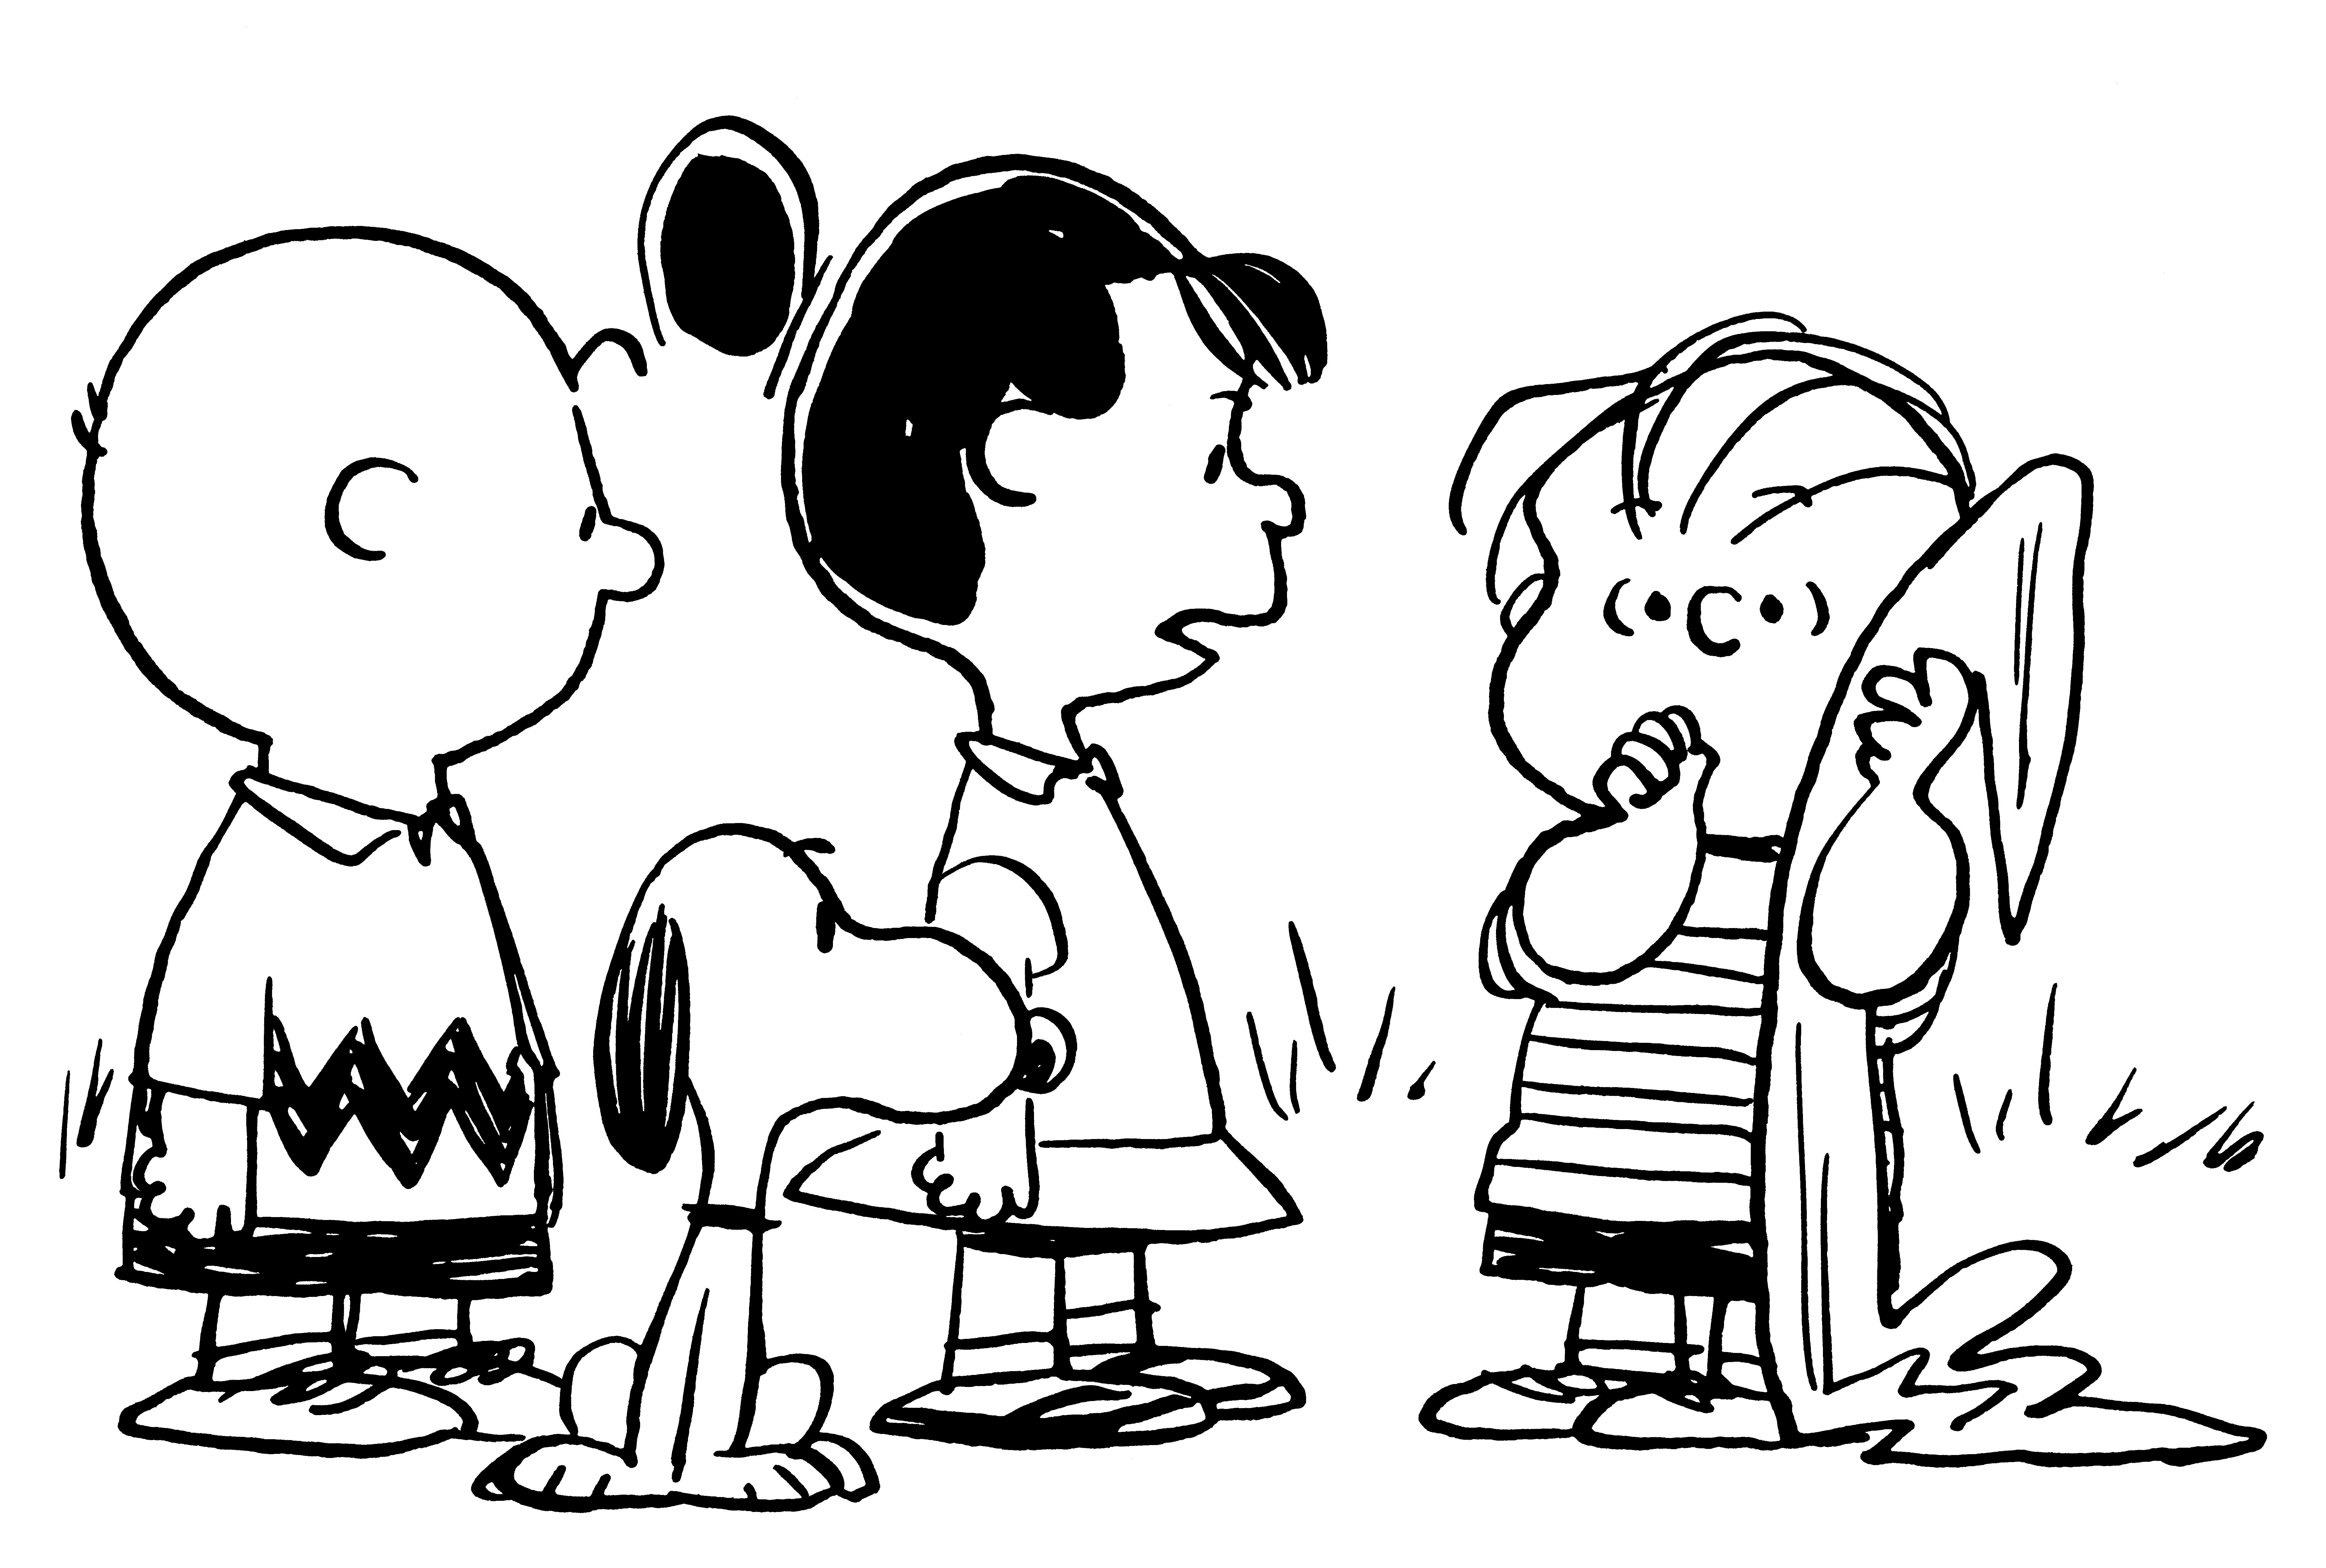 12 themes that make peanuts timeless threadless blog